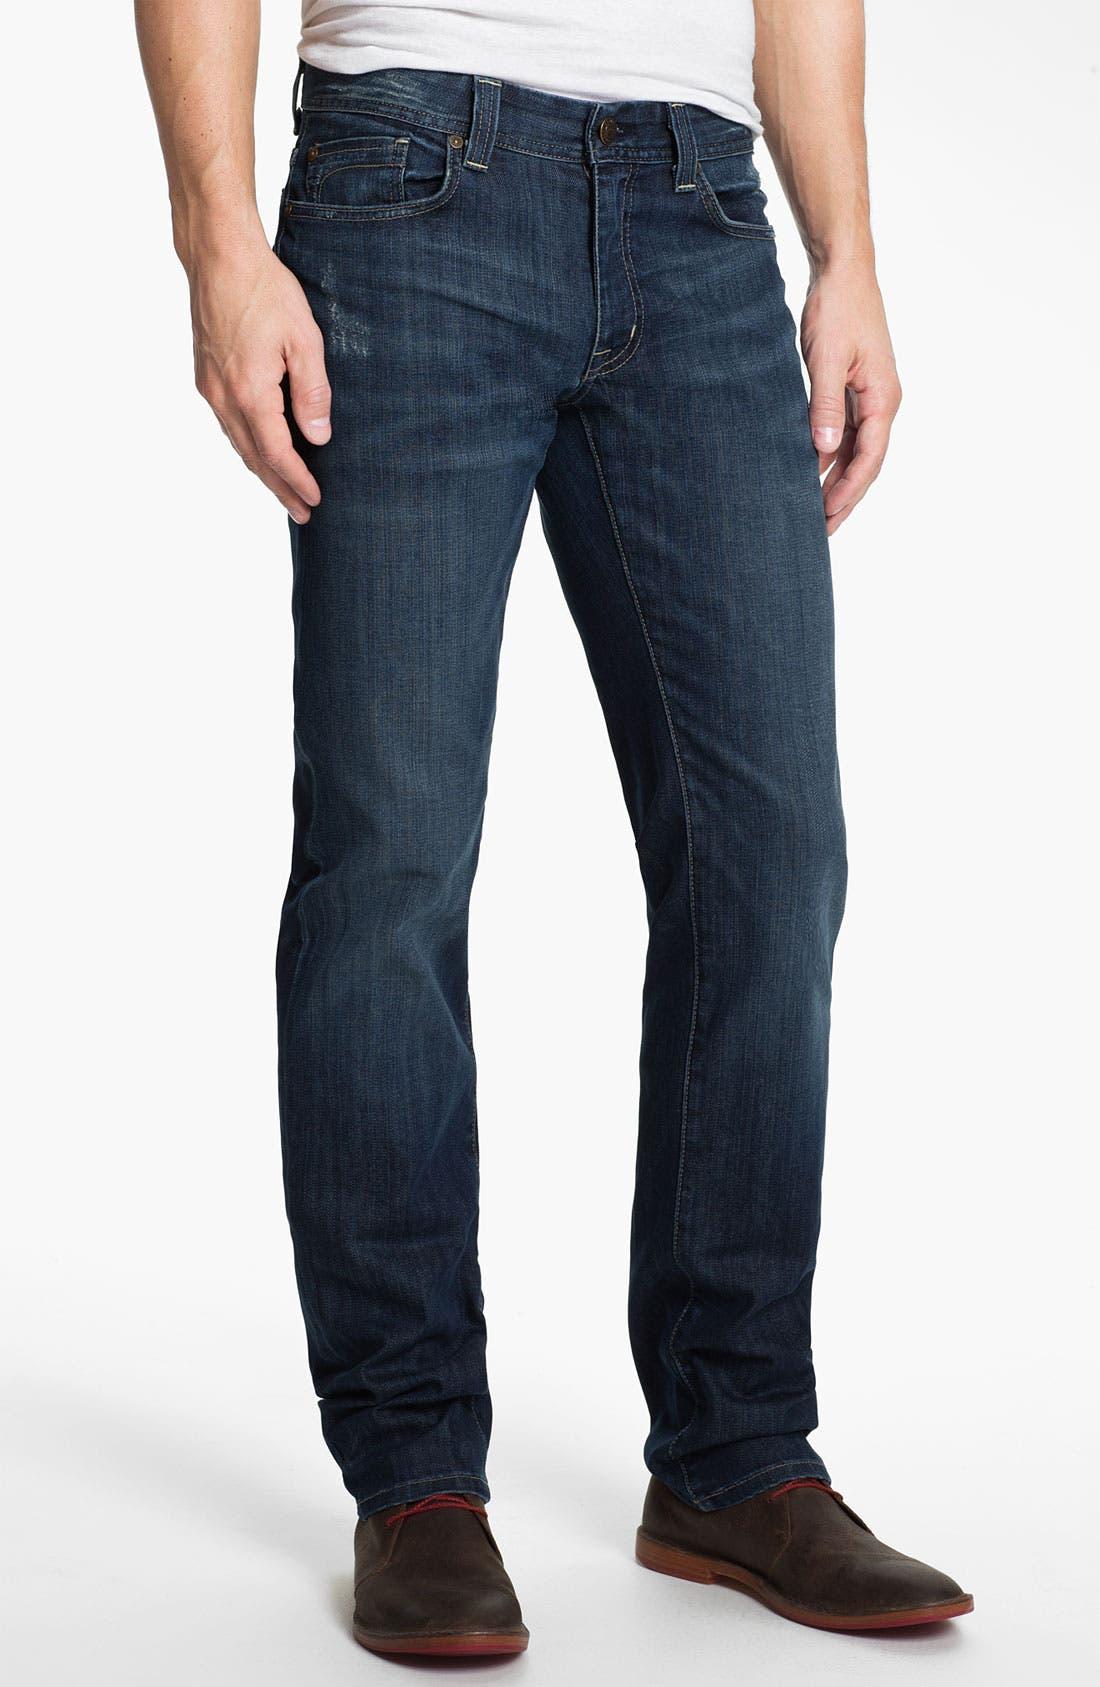 Alternate Image 1 Selected - Fidelity Denim 'Slim Jim' Slim Straight Leg Jeans (Exile Vintage)